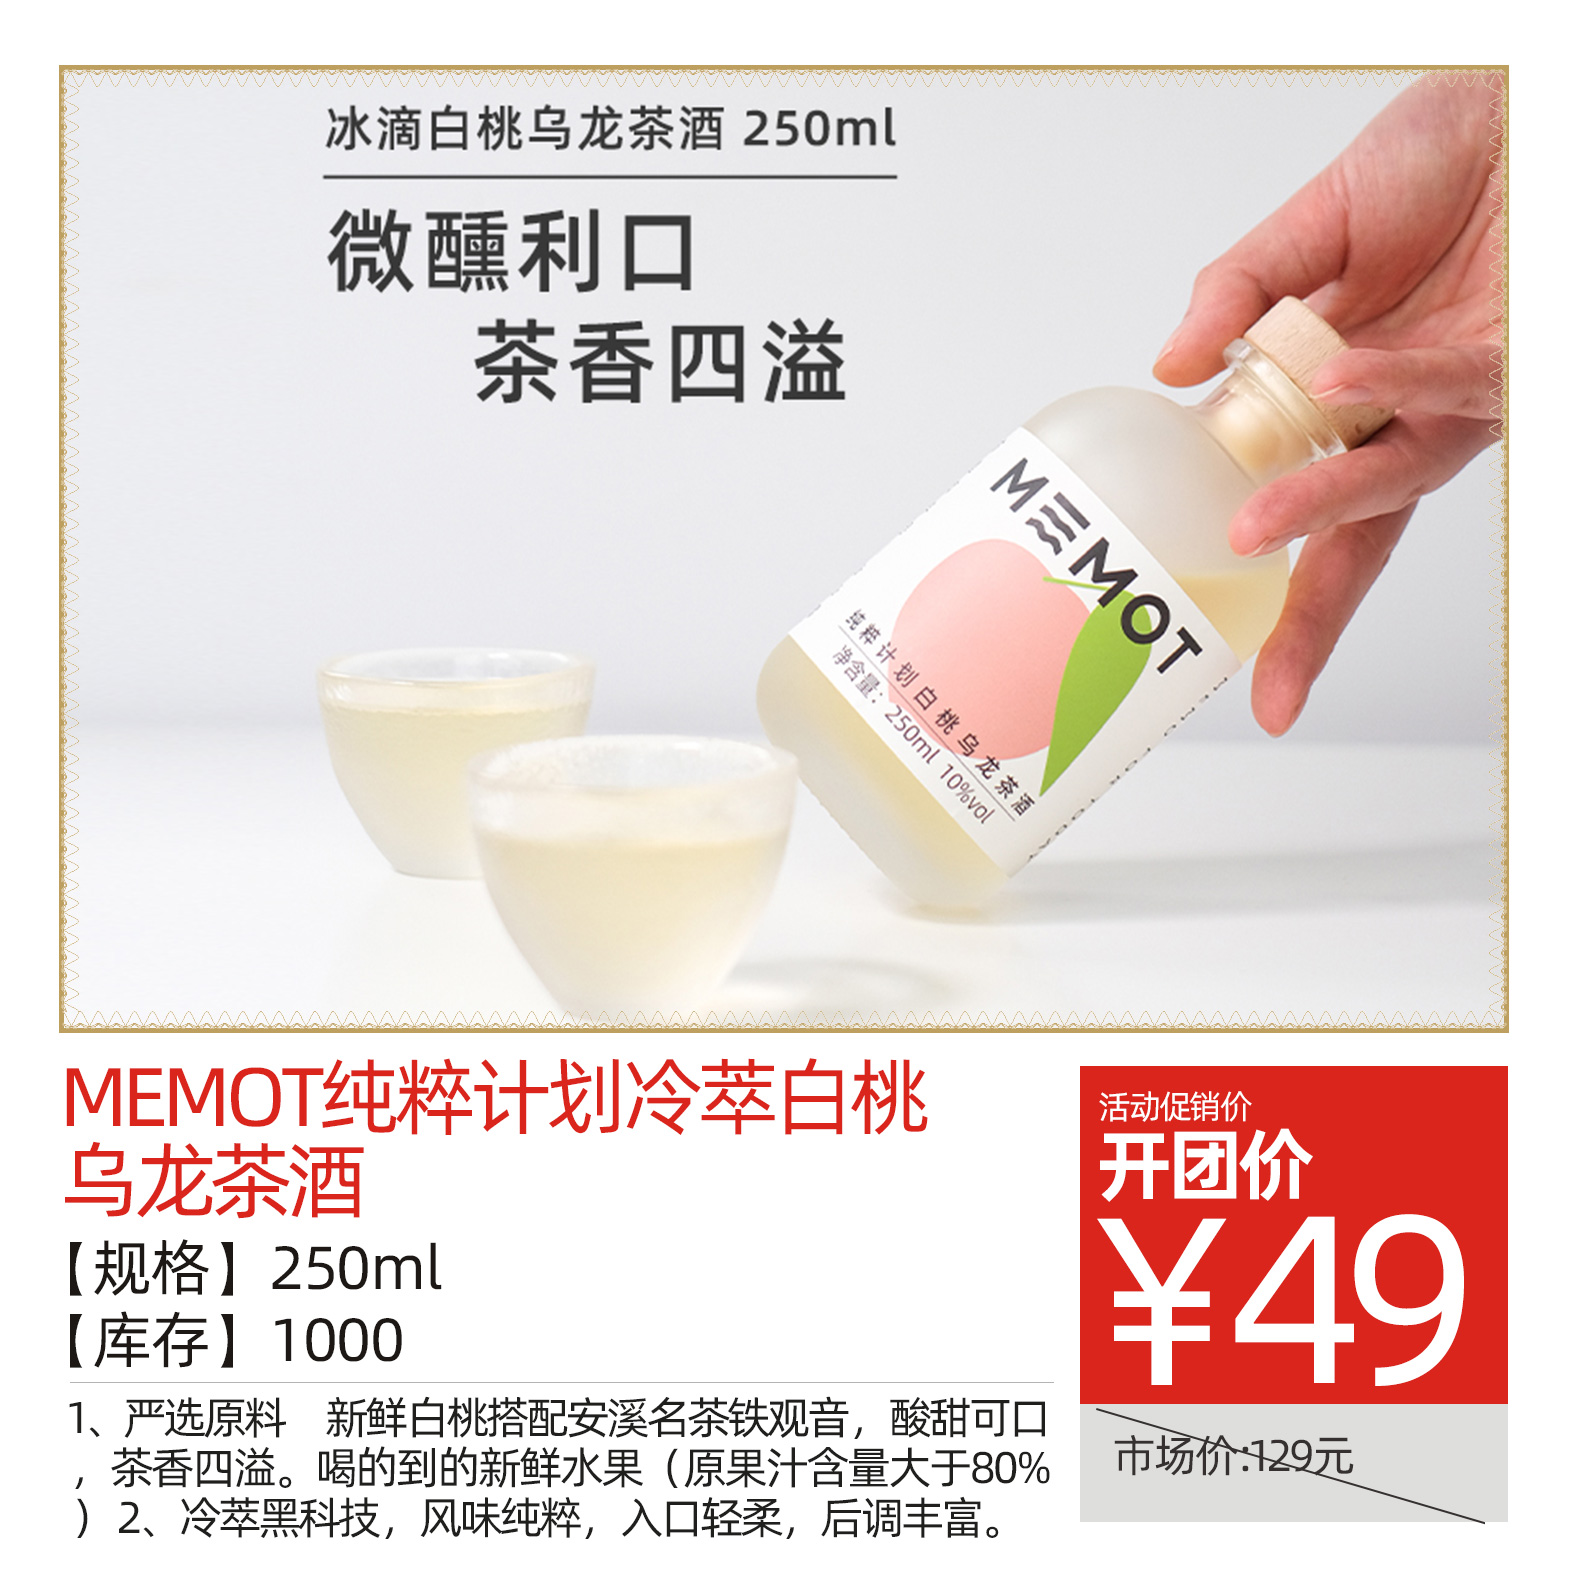 memot纯粹计划冷萃白桃乌龙茶酒